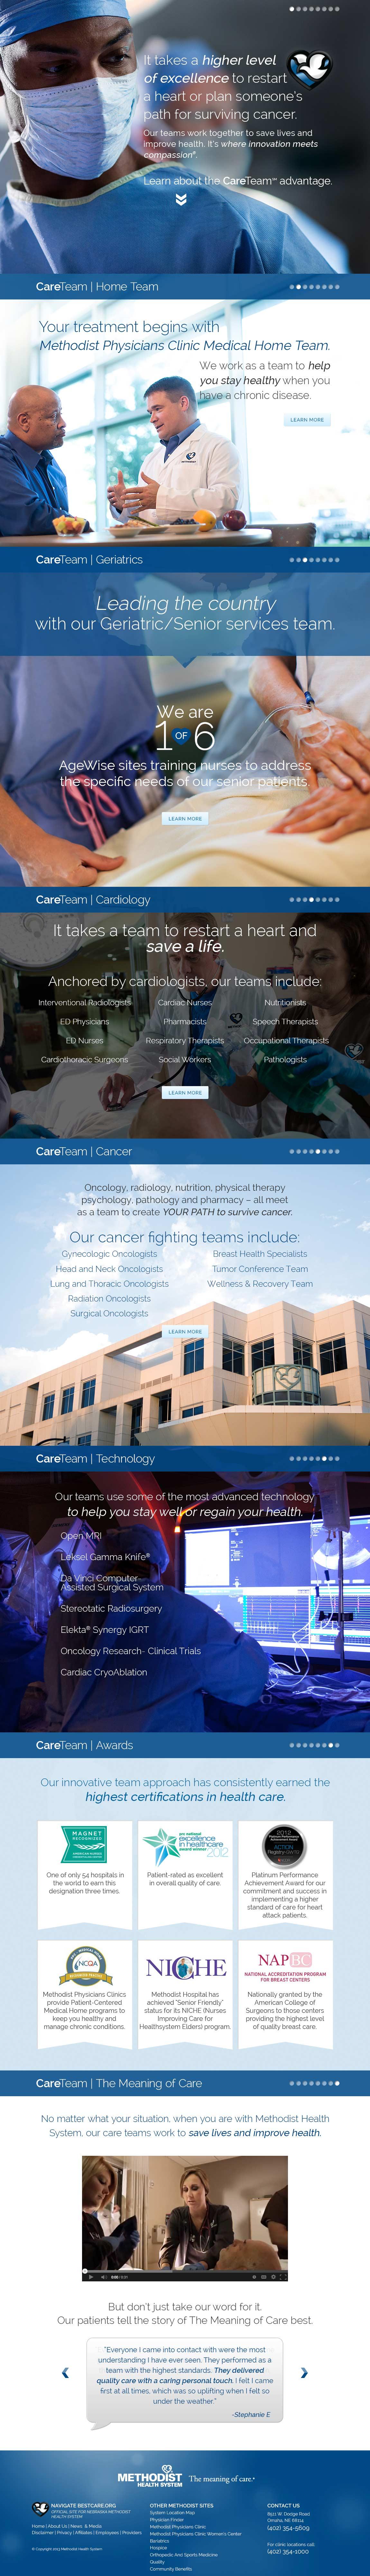 Methodist Health System CareTeam Website Screenshot